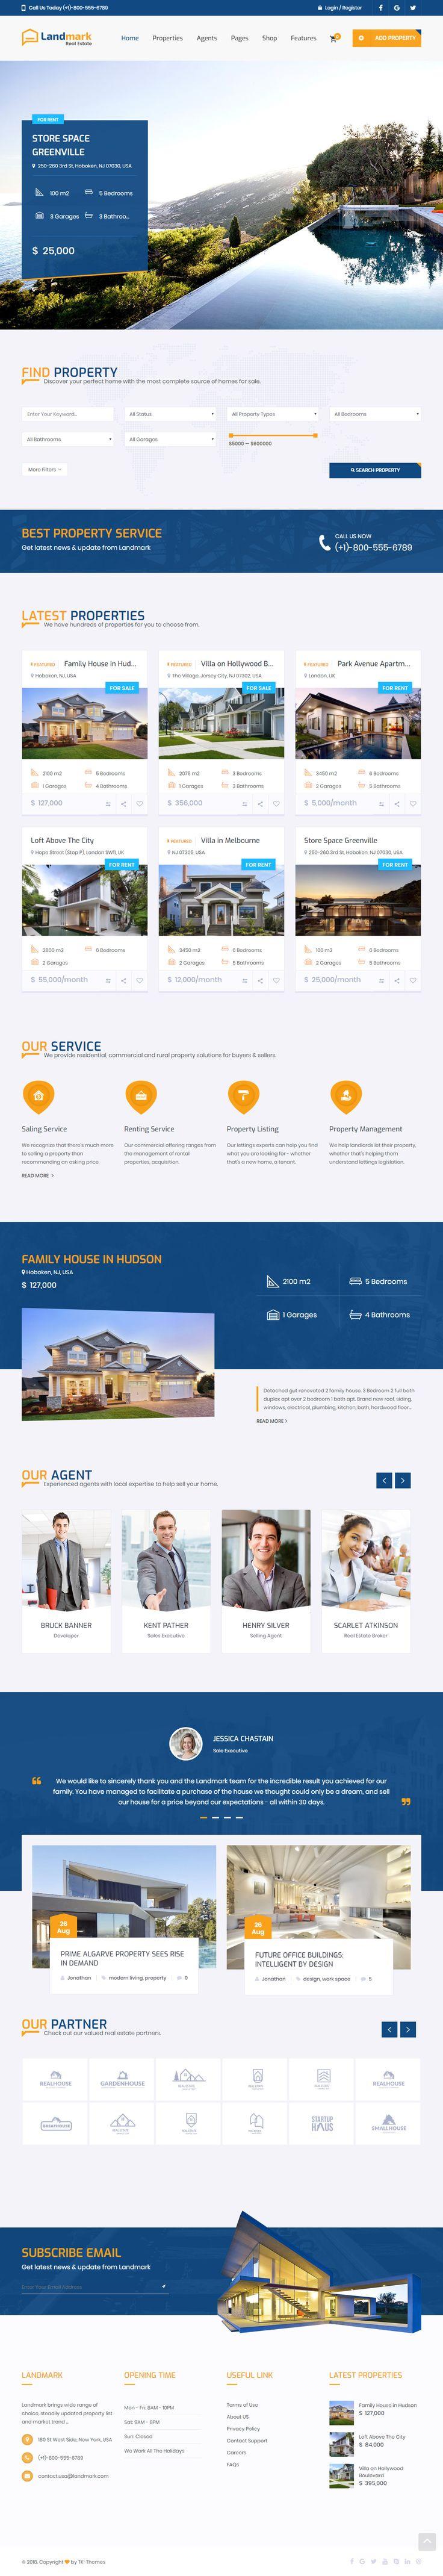 3586 best Webdesign Ideen images on Pinterest | Design websites ...